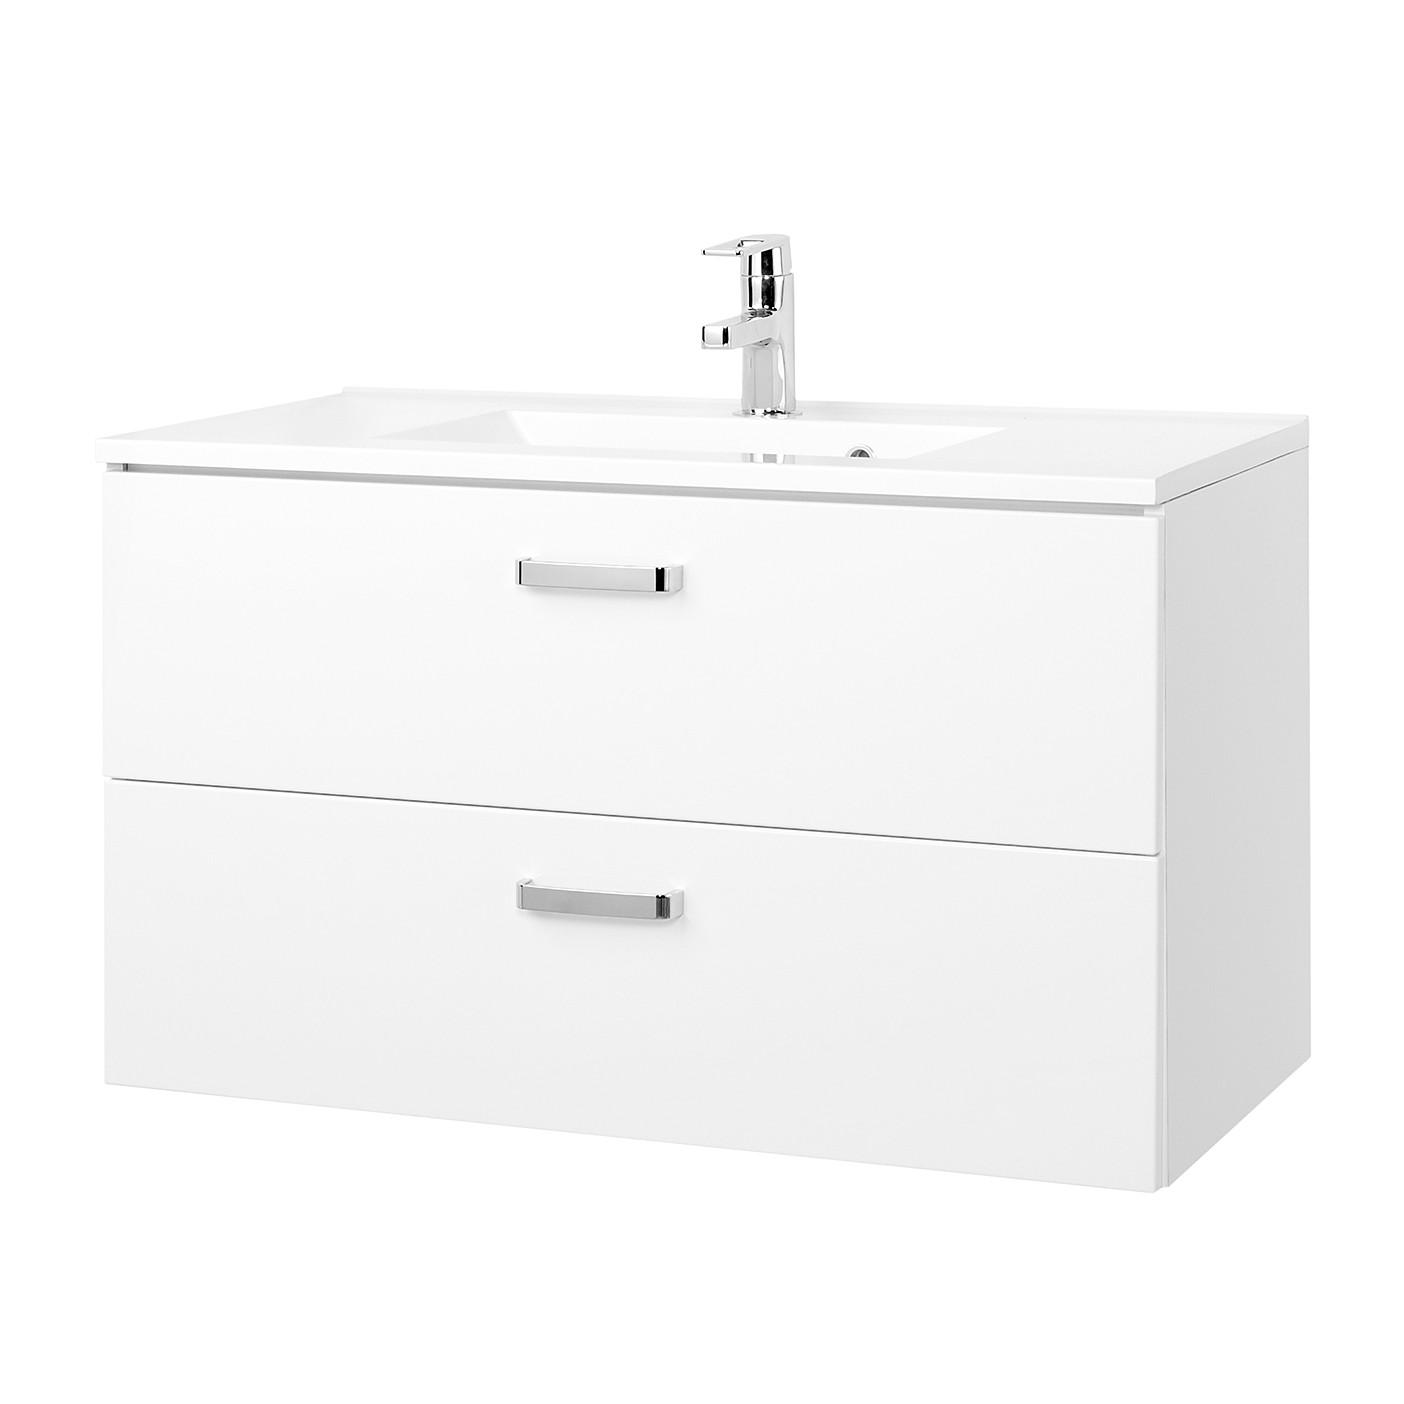 Mobile lavabo Zeehan - Bianco - 90 cm, Giessbach